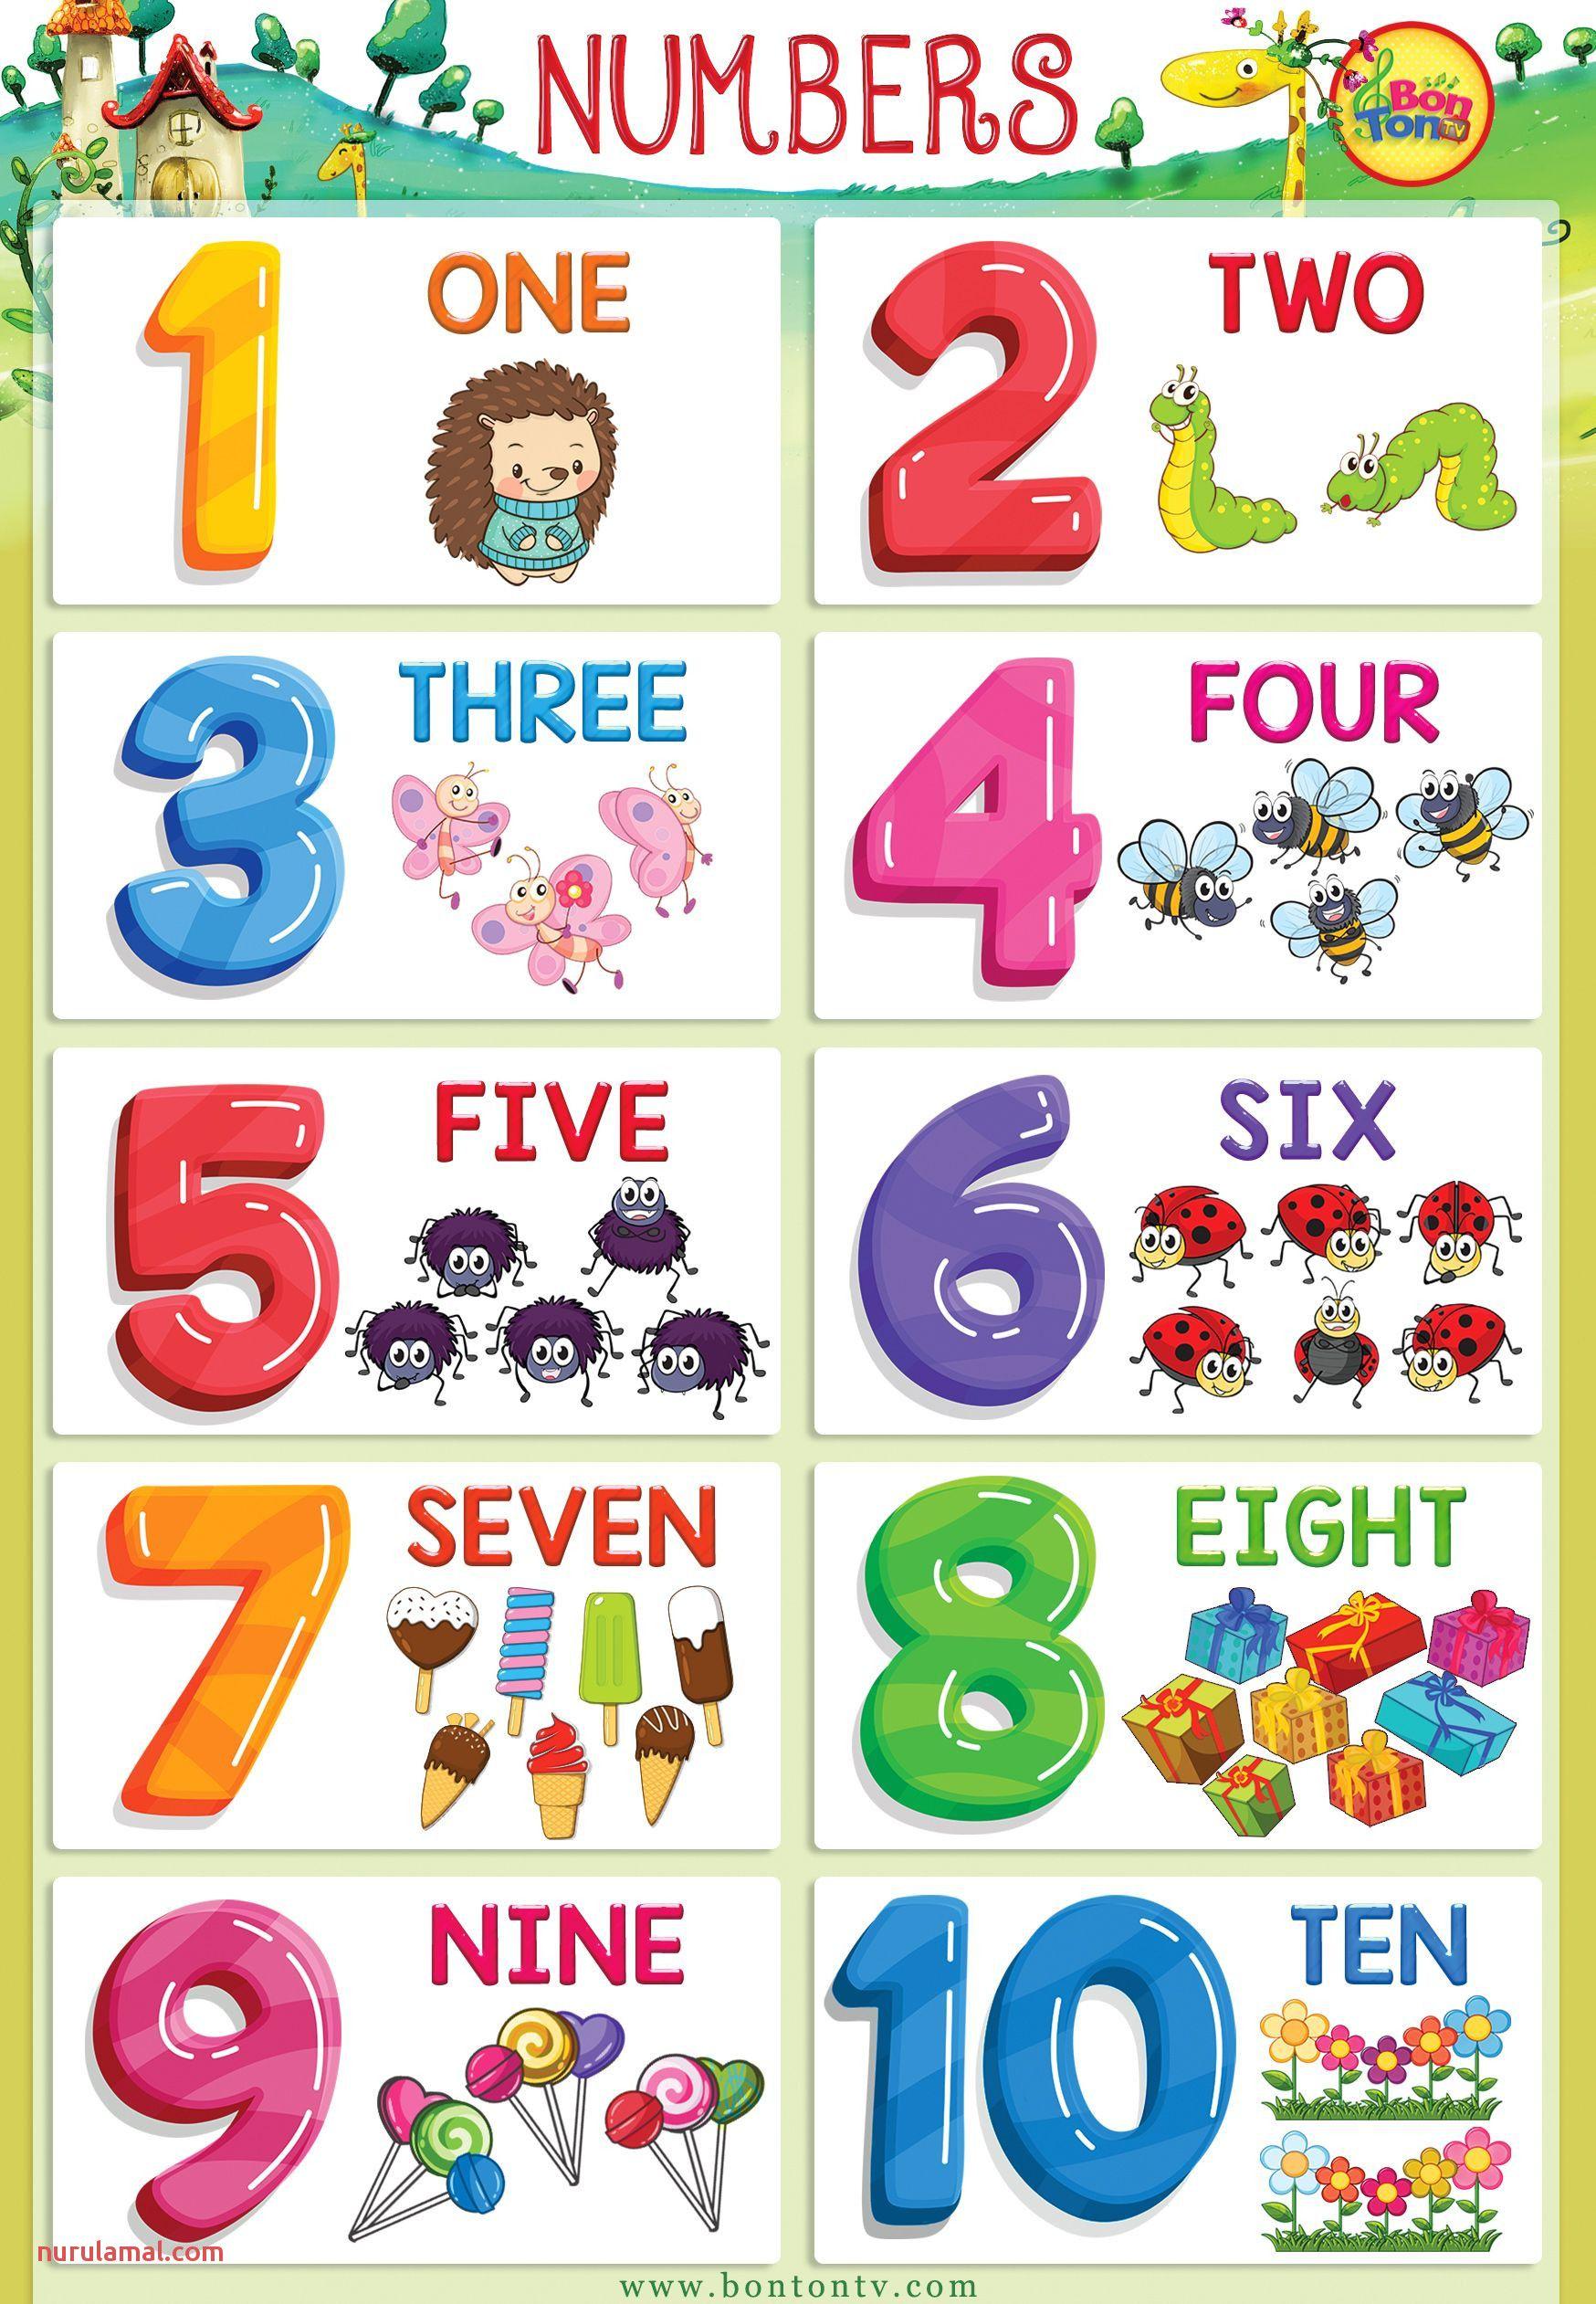 Bug Math Worksheets Preschool Learning Numbers Preschool Numbers Preschool Printables Kids Worksheets Preschool [ 2523 x 1748 Pixel ]